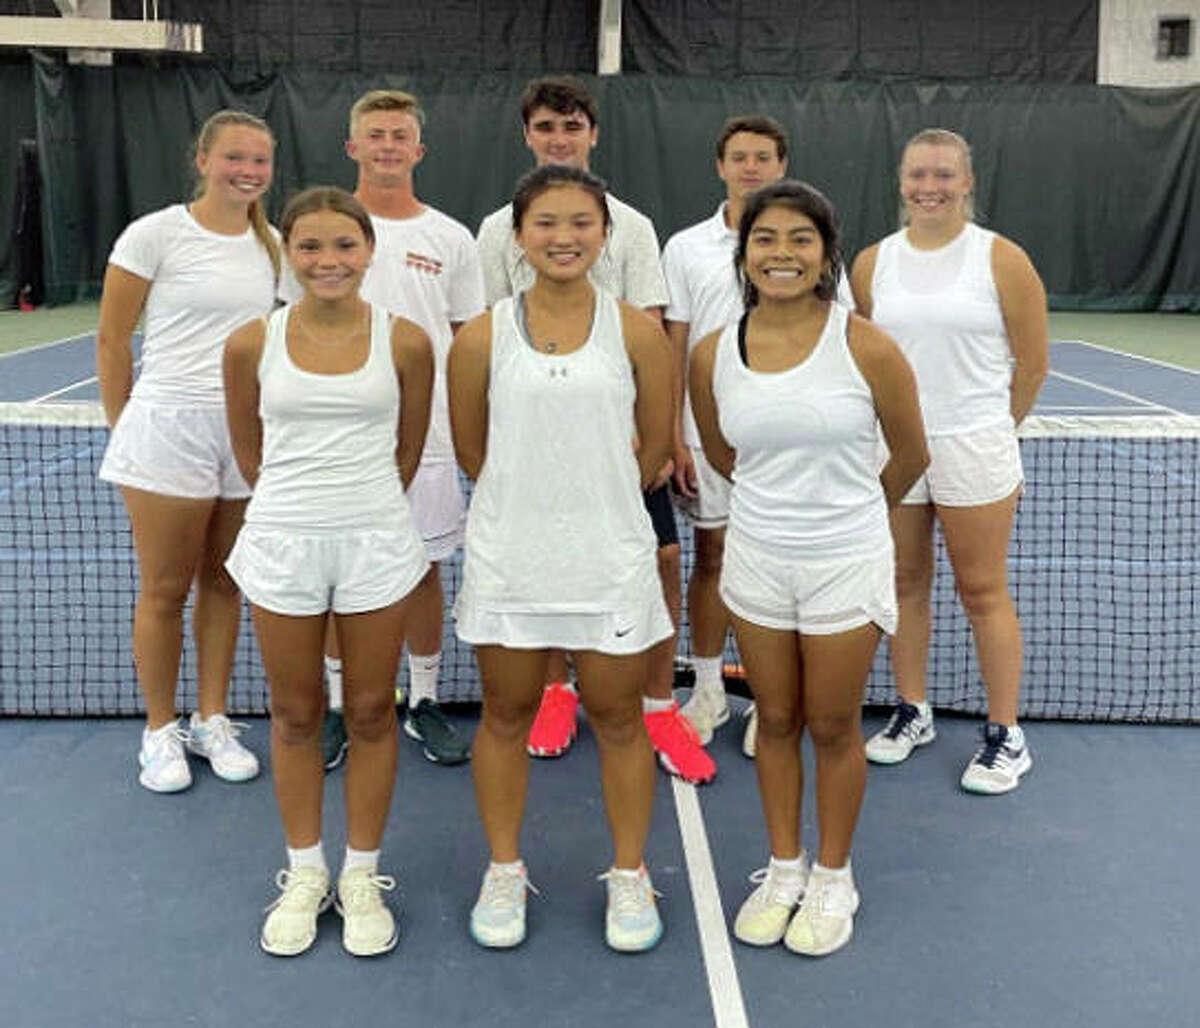 Members of the Edwardsville Junior Tennis 18 Gold team pose inside the YMCA Meyer Center.